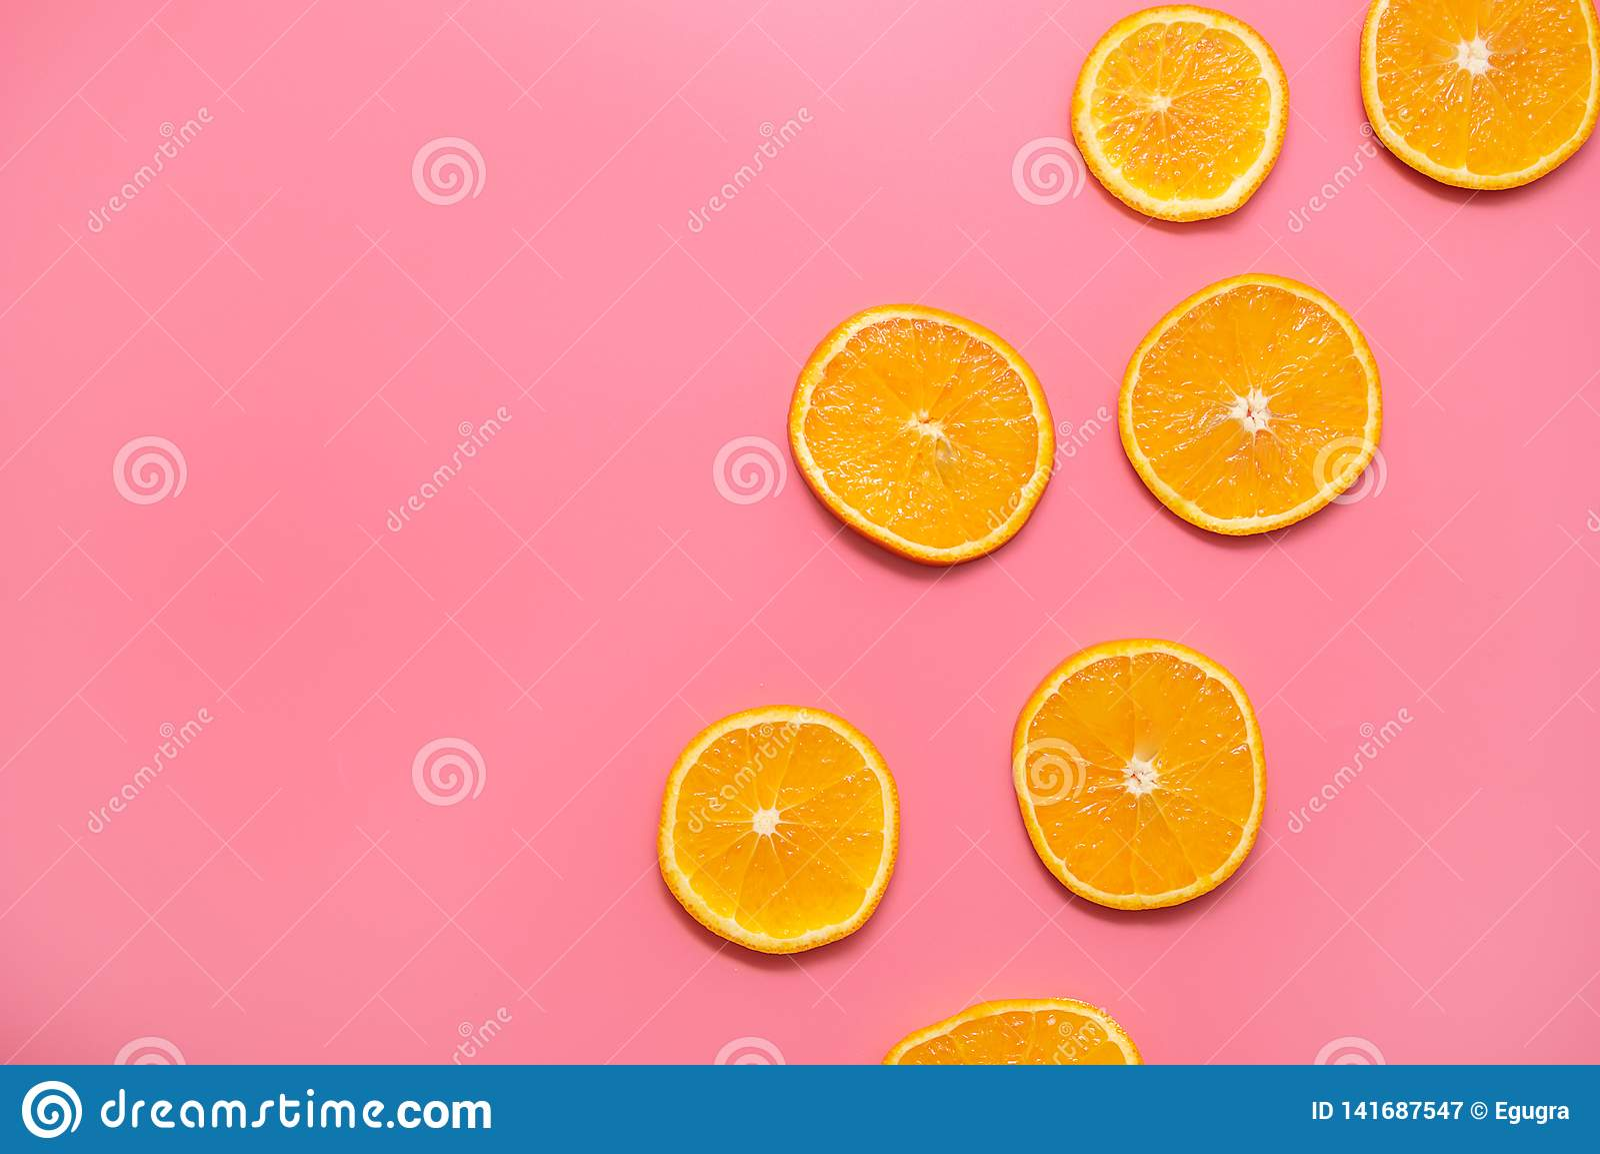 Orange slices on a pink background. fresh orange slices fruit pattern on pink background